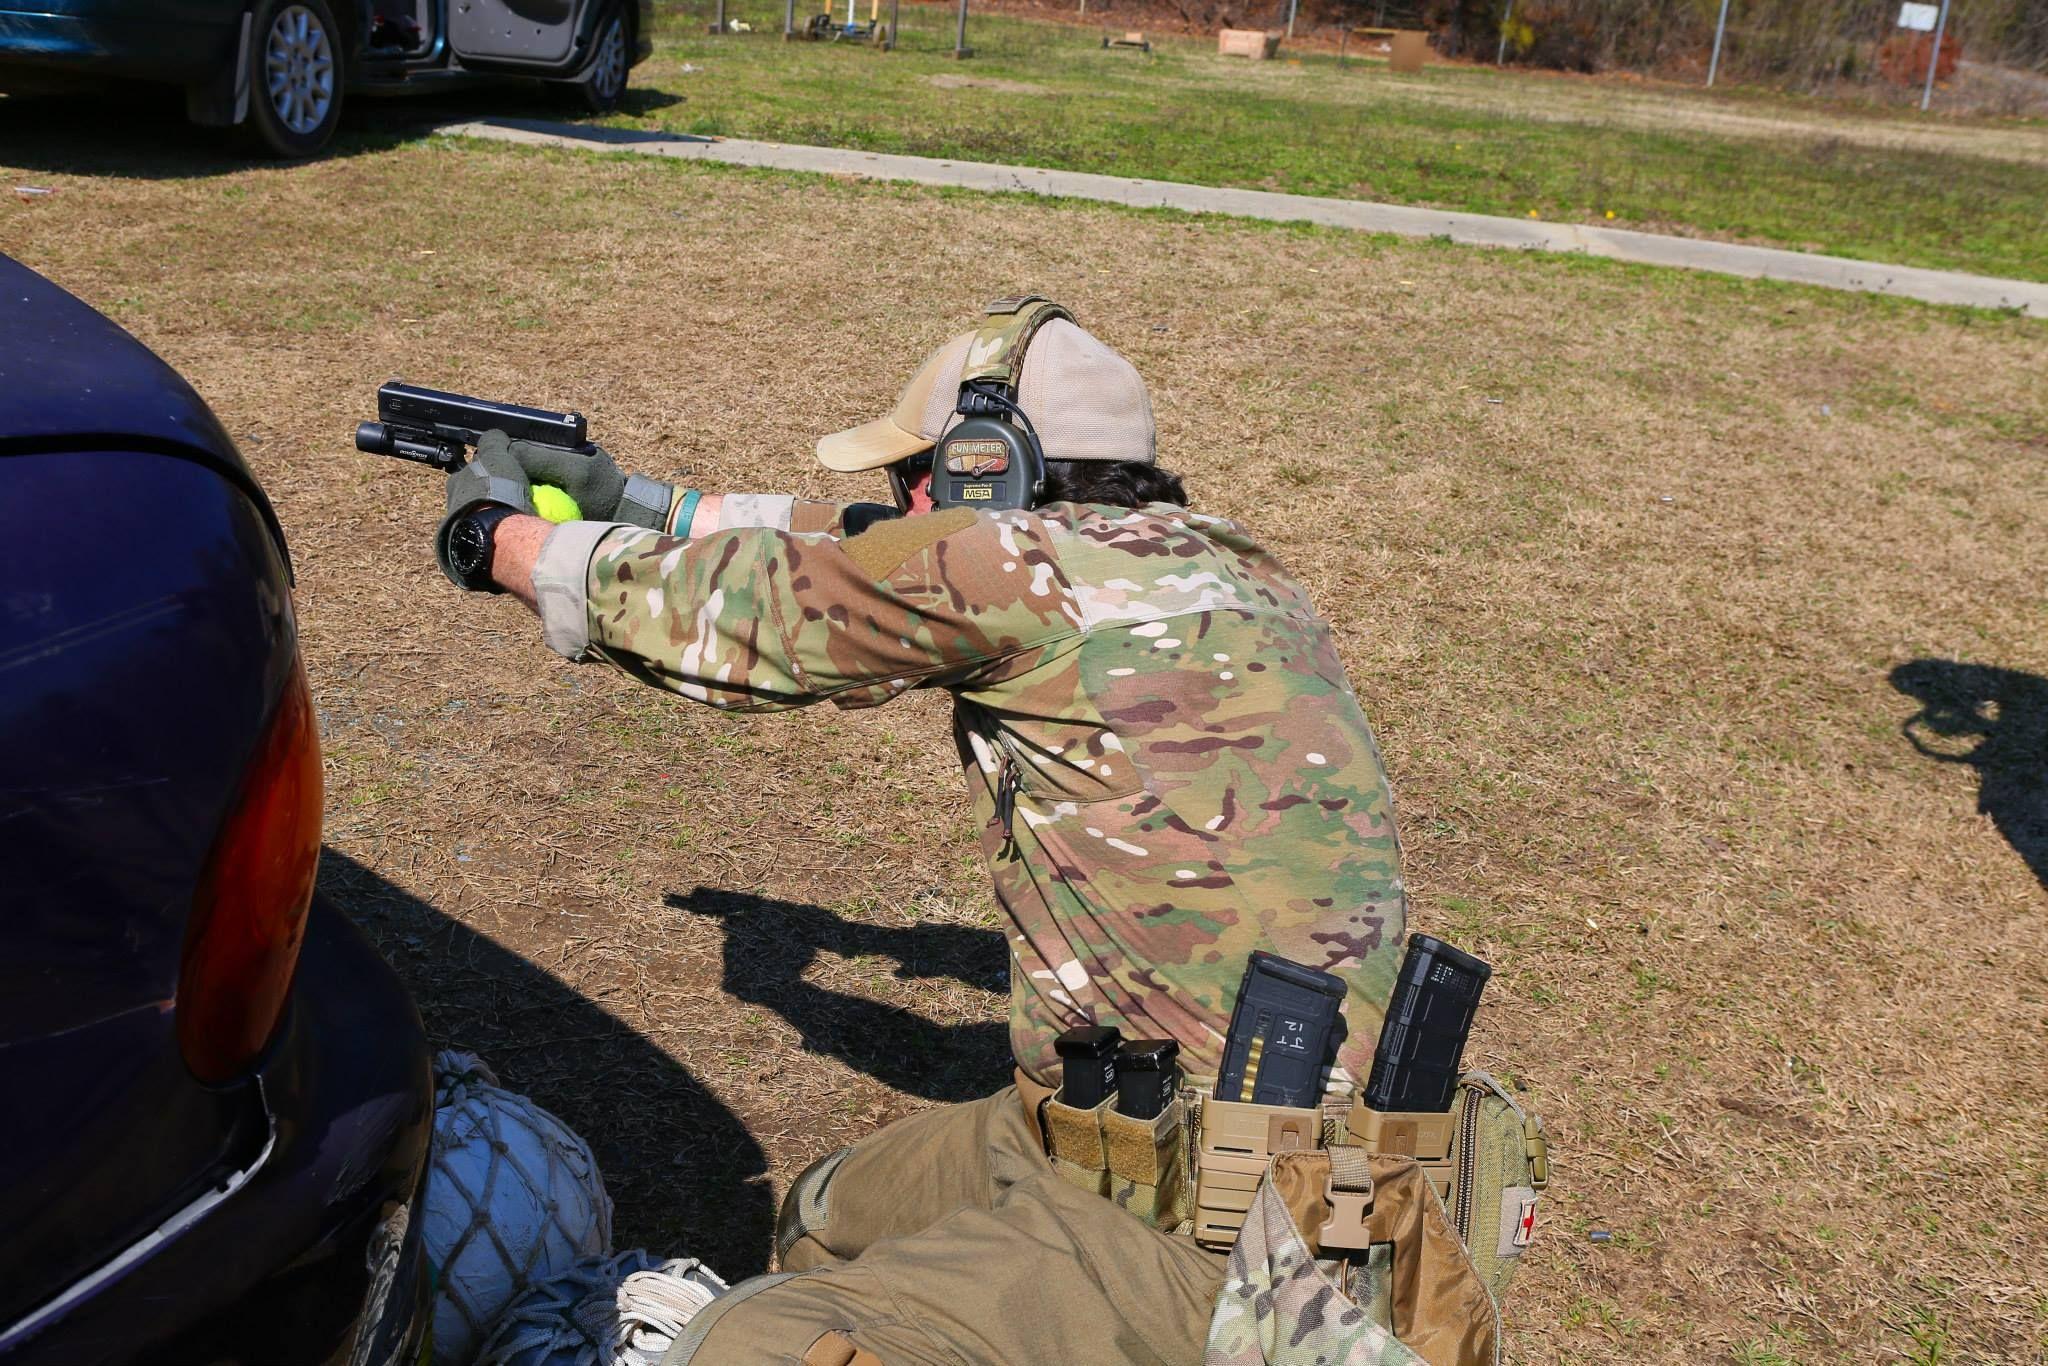 Talon Defense Dark Gunfighter - Pistol/Rifle Vehicle Defense and Counter Defense https://www.facebook.com/TalonDefense.org